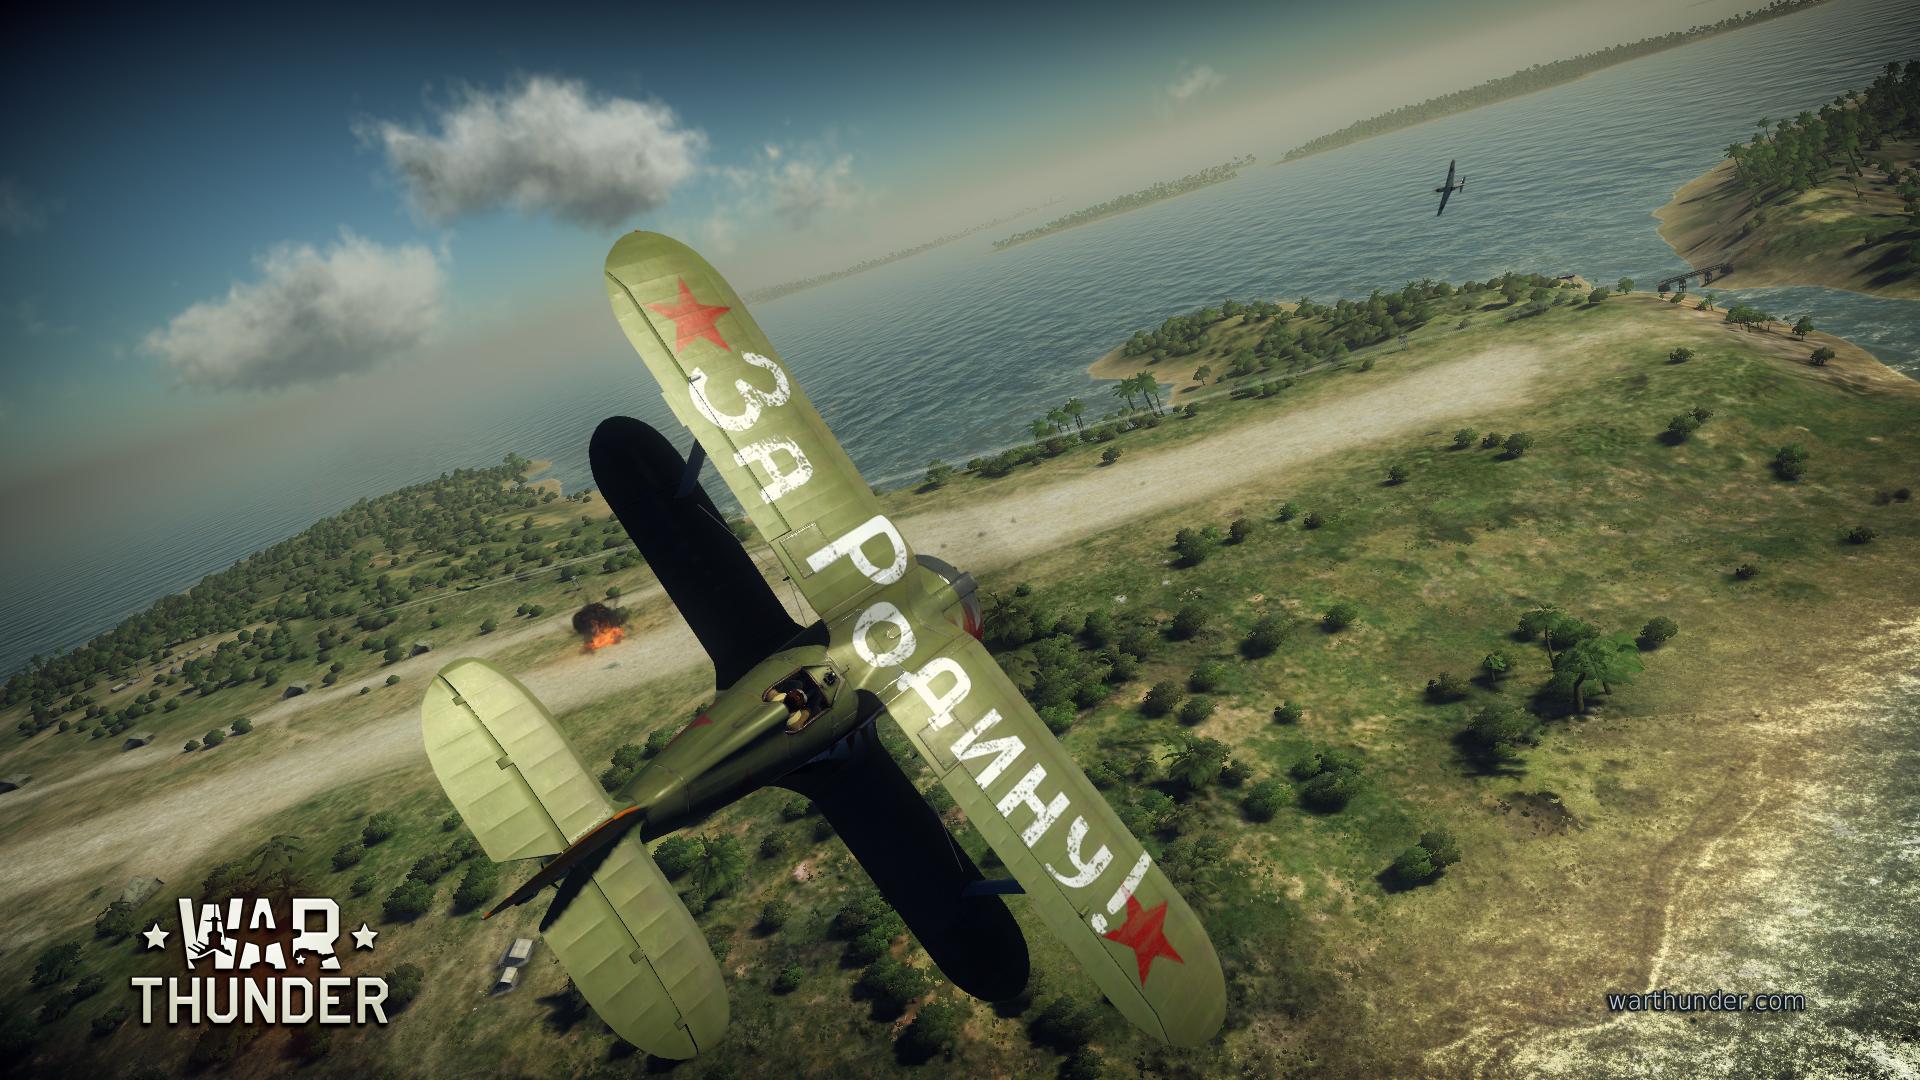 War Thunder - Screenshot Full HD - 1920x1080